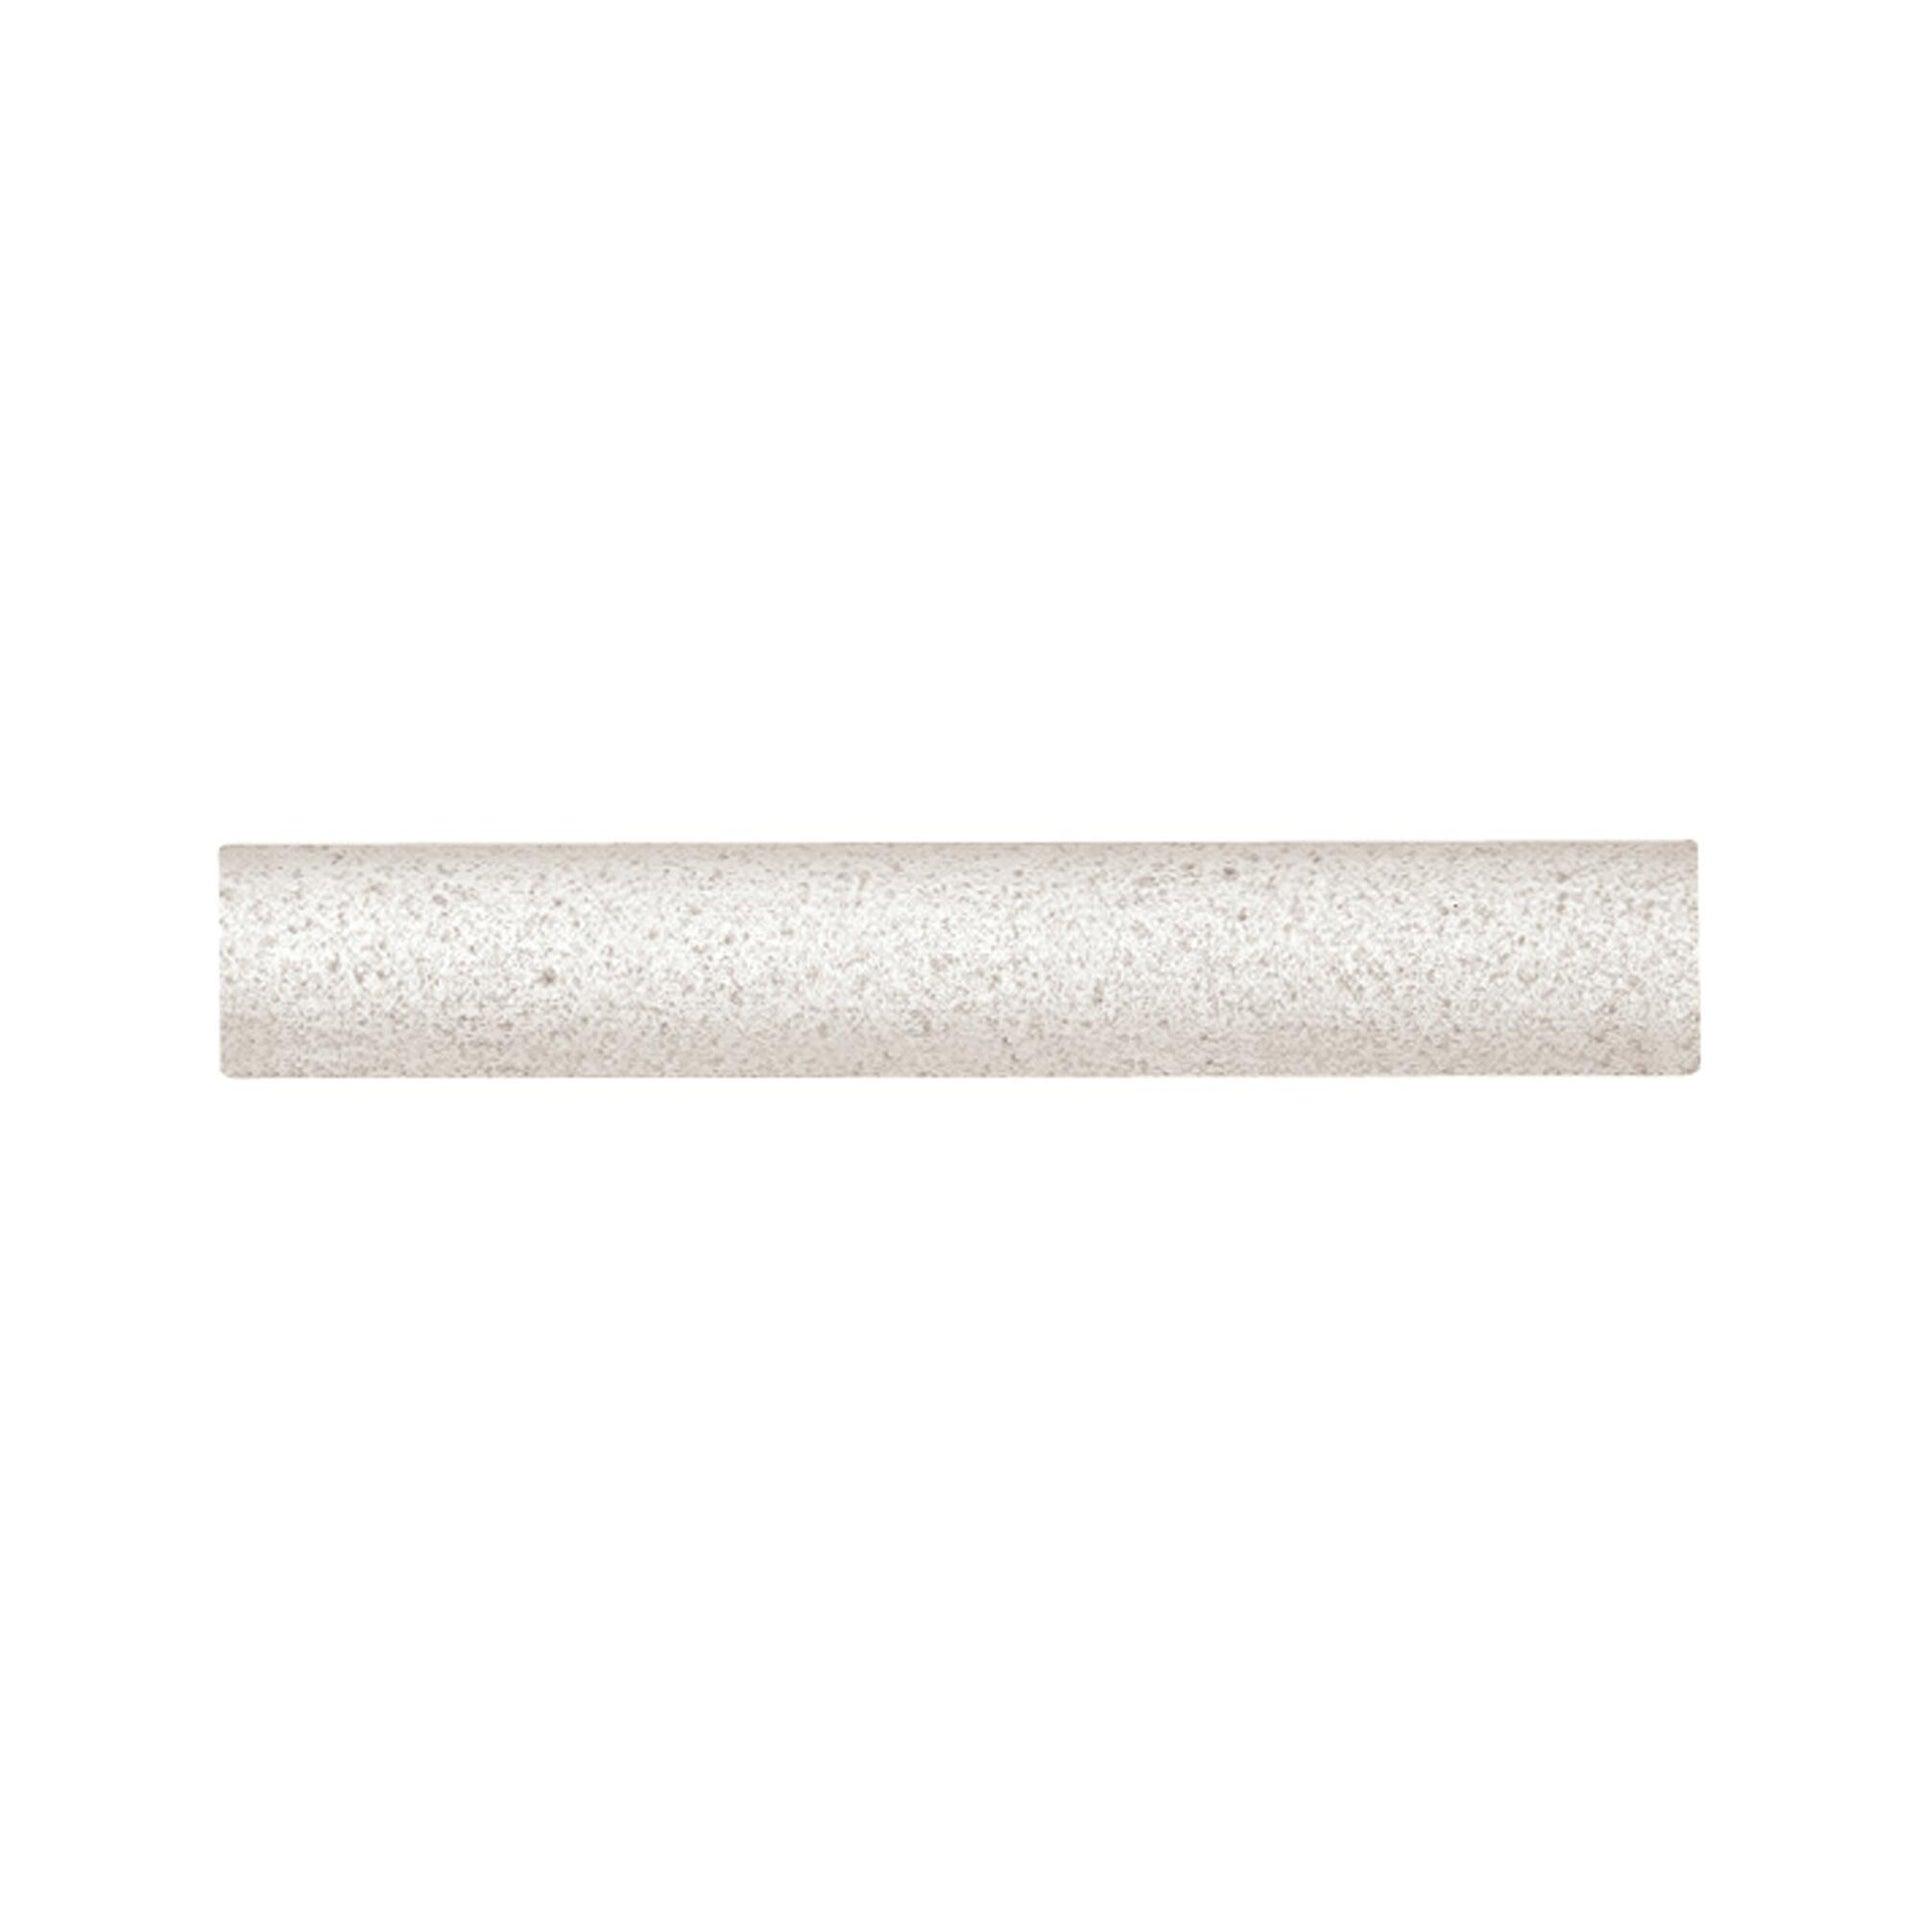 Listello Country L 1.5 x 10 cm bianco - 1